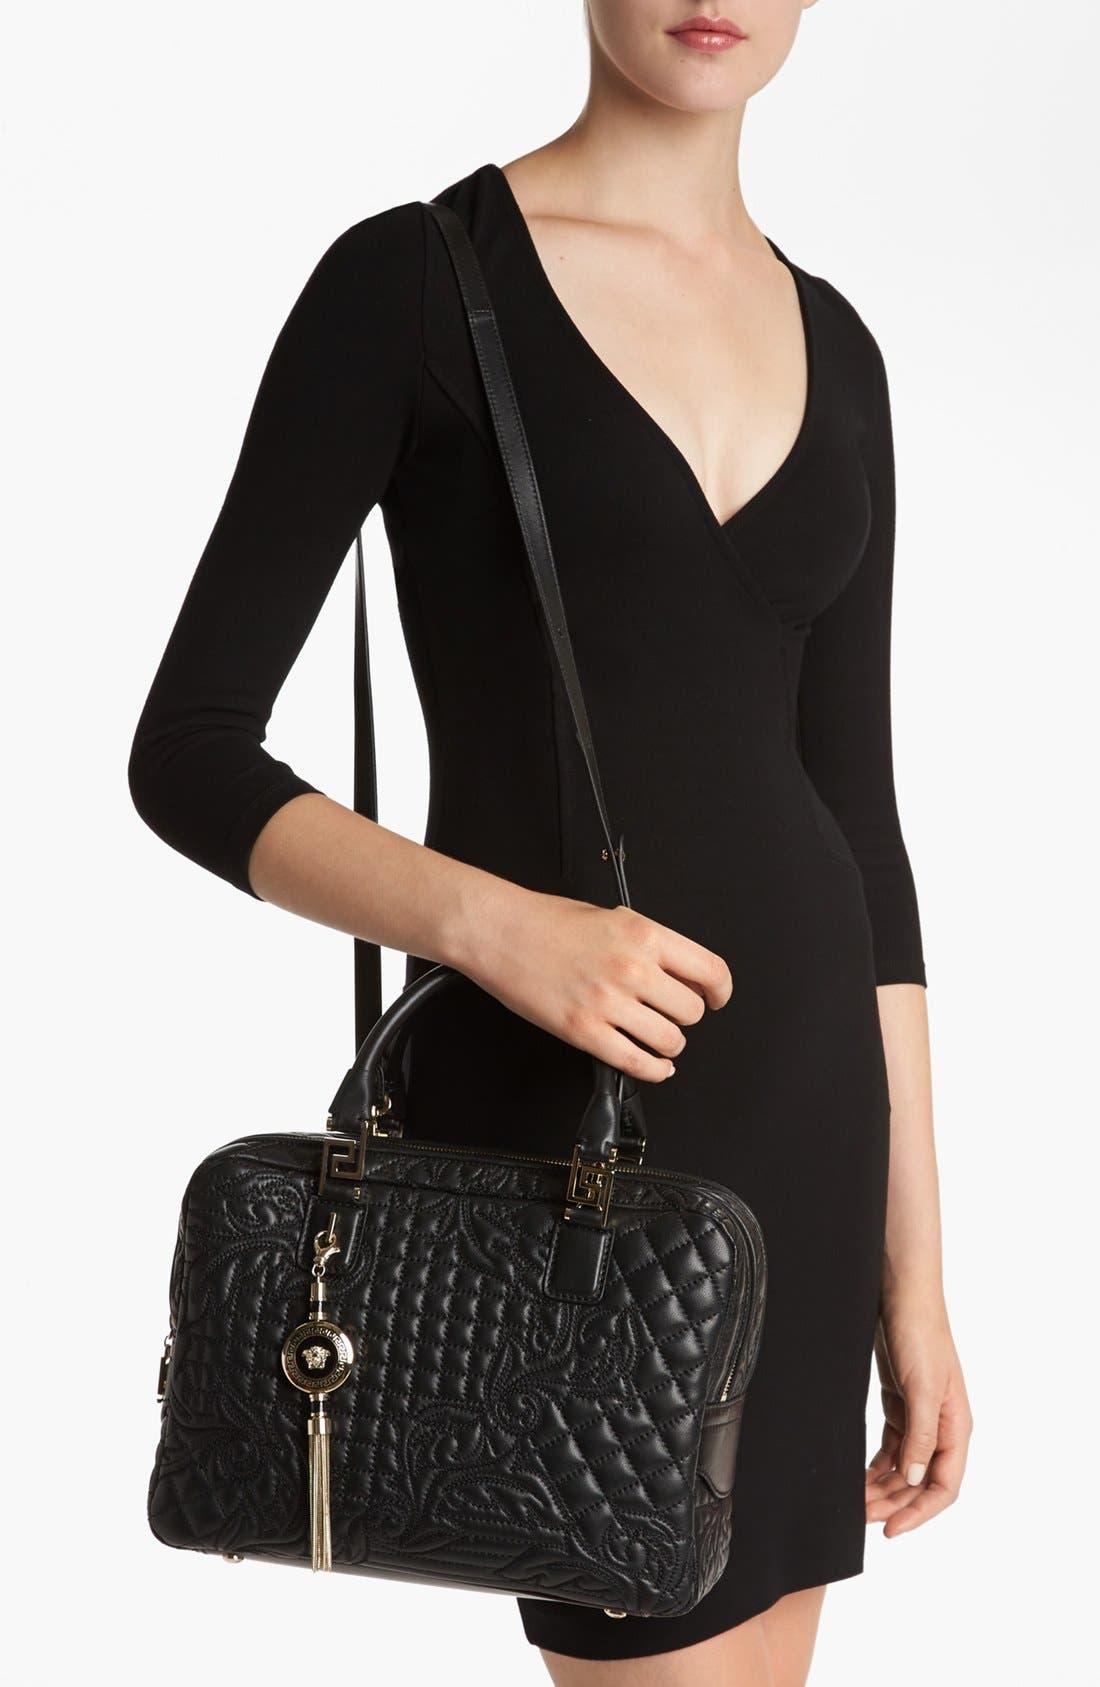 Alternate Image 2  - Versace 'Linea' Embroidered Leather Satchel